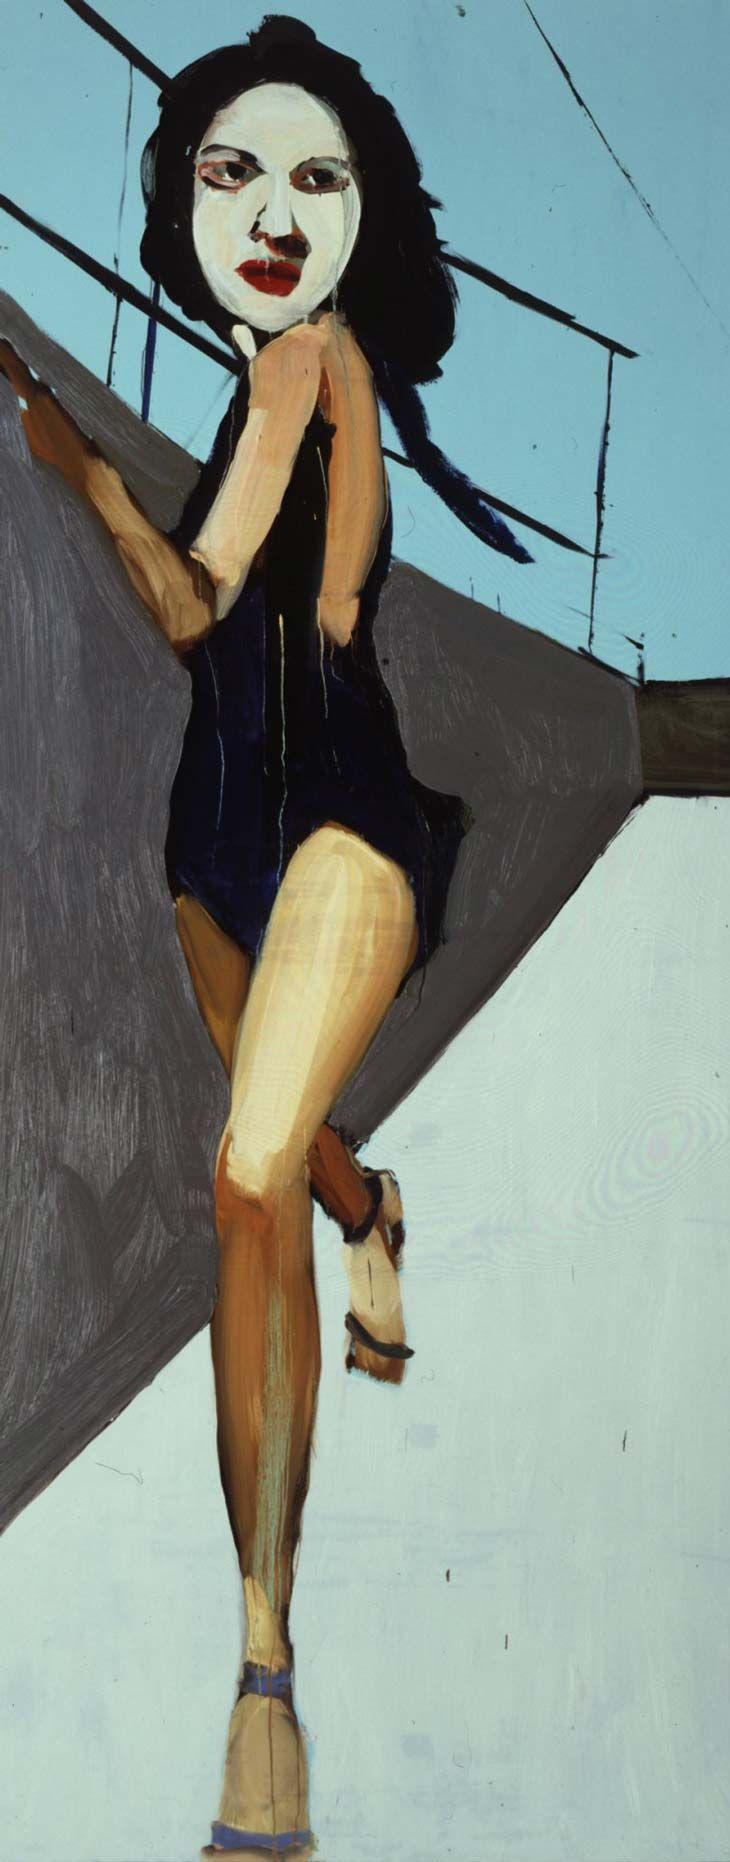 Chantal Joffe  Google Image Result for http://www.saatchi-gallery.co.uk/imgs/artists/joffe-chantal/chantal_joffe_walking_woman.jpg